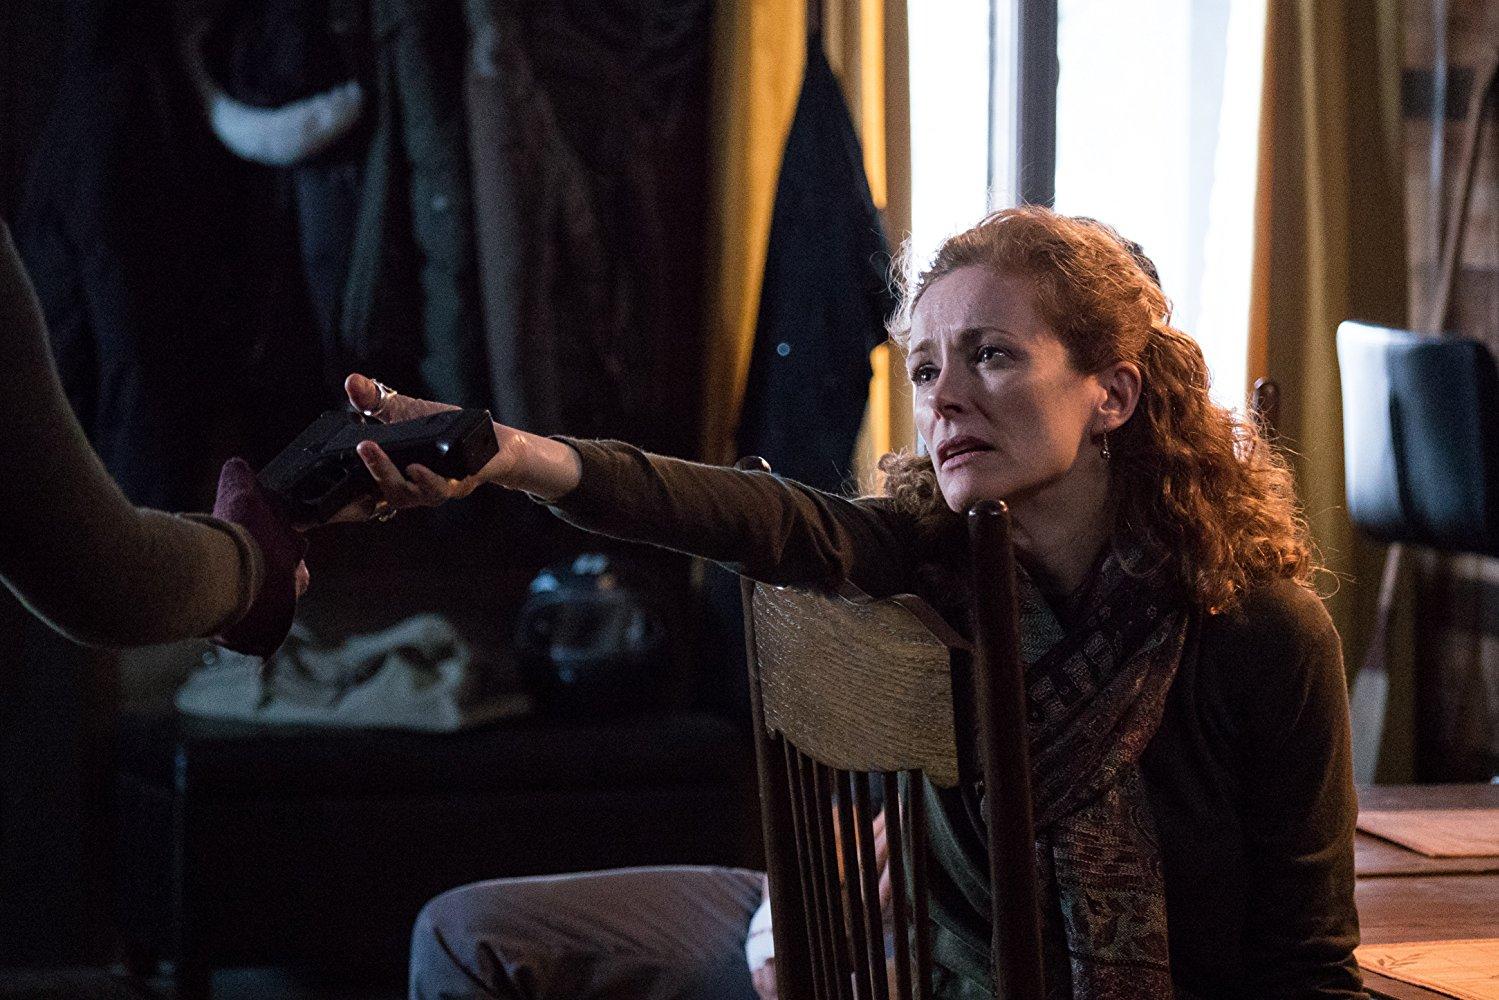 Wren american horror story actress dating